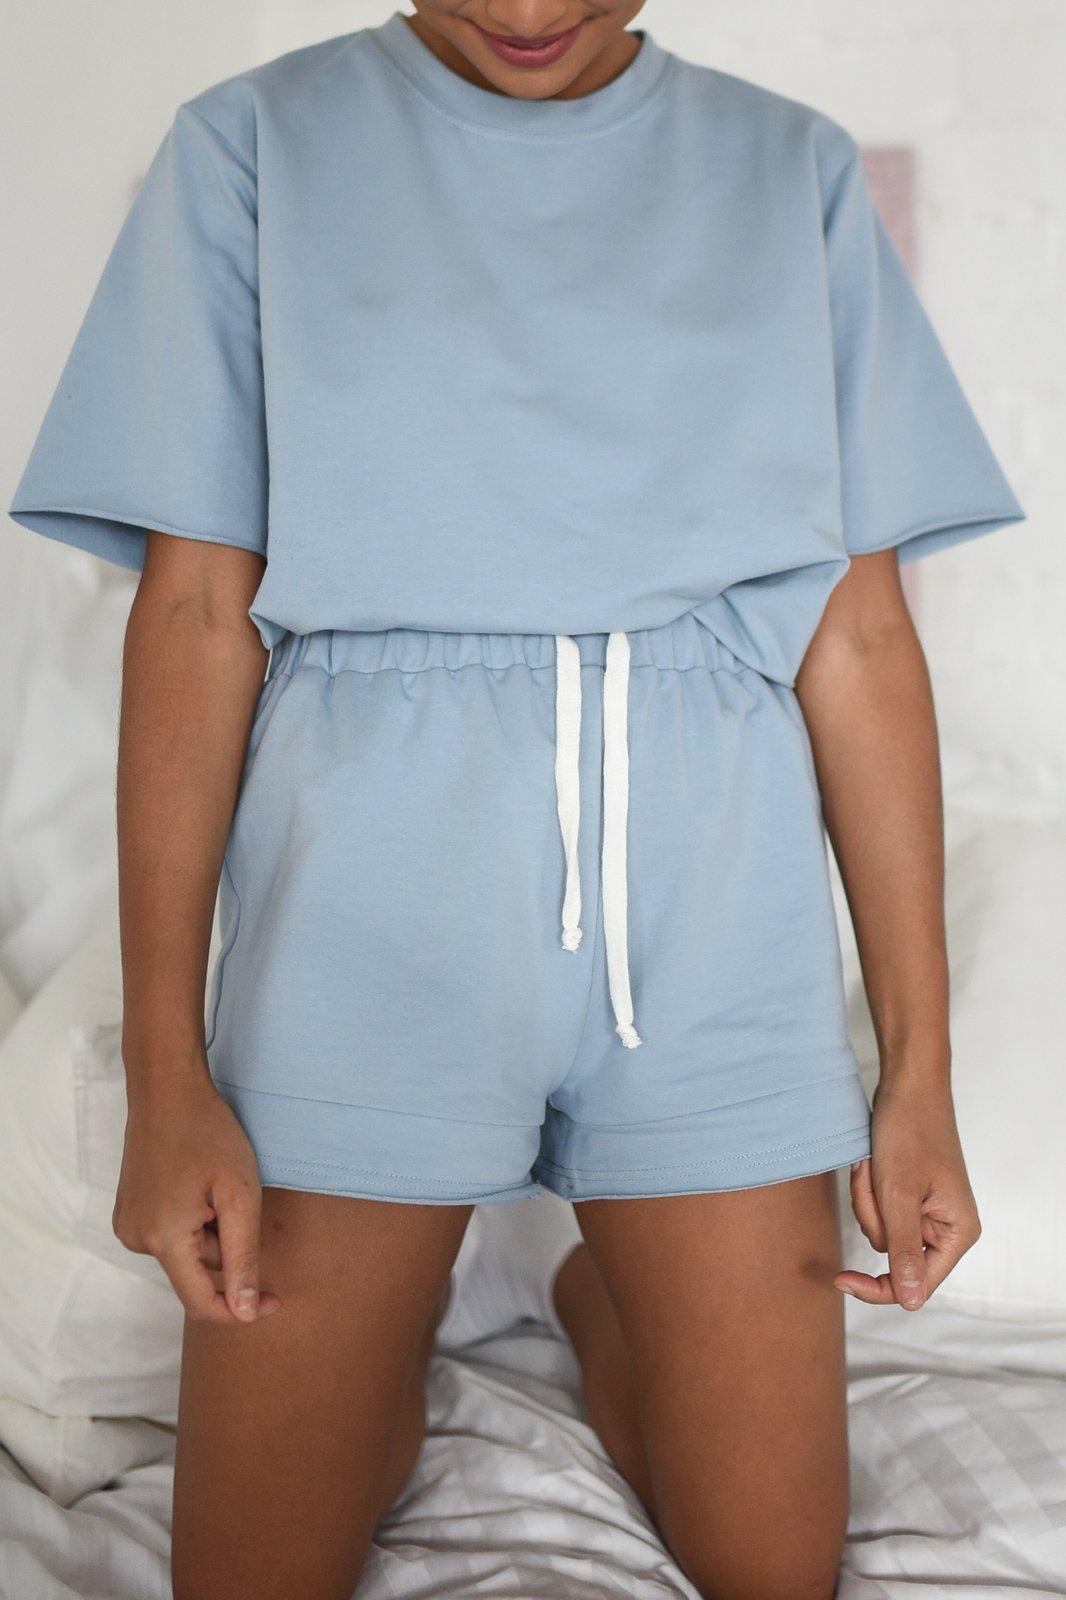 CHEAP Bahari Dusty Blue Shorts 28617024033 – Women's Trousers